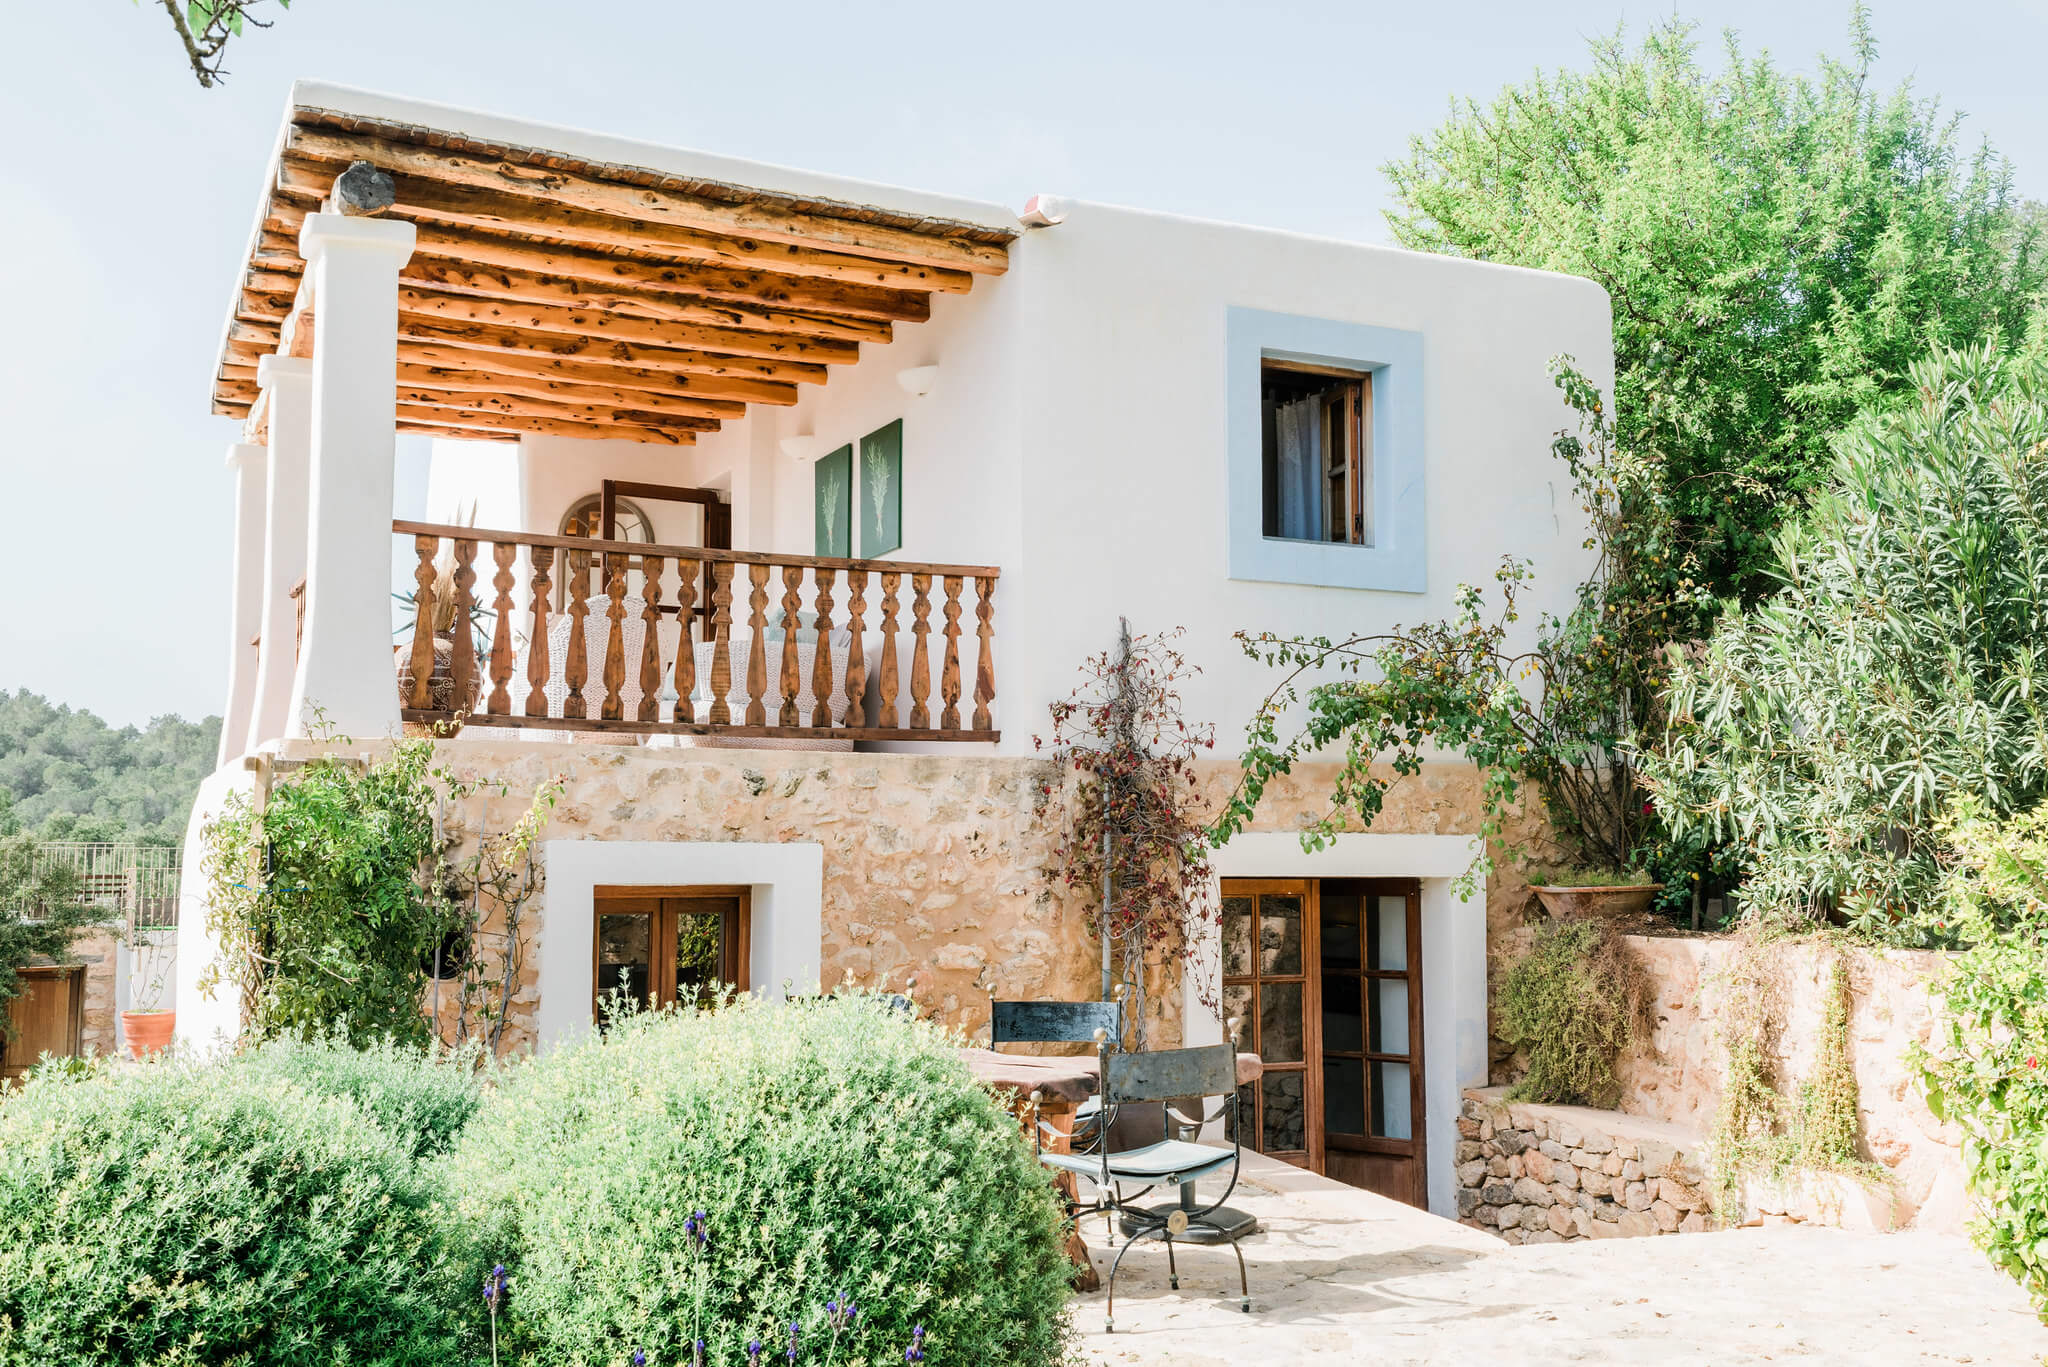 https://www.white-ibiza.com/wp-content/uploads/2020/06/white-ibiza-villas-los-corrales-exterior-outside.jpg